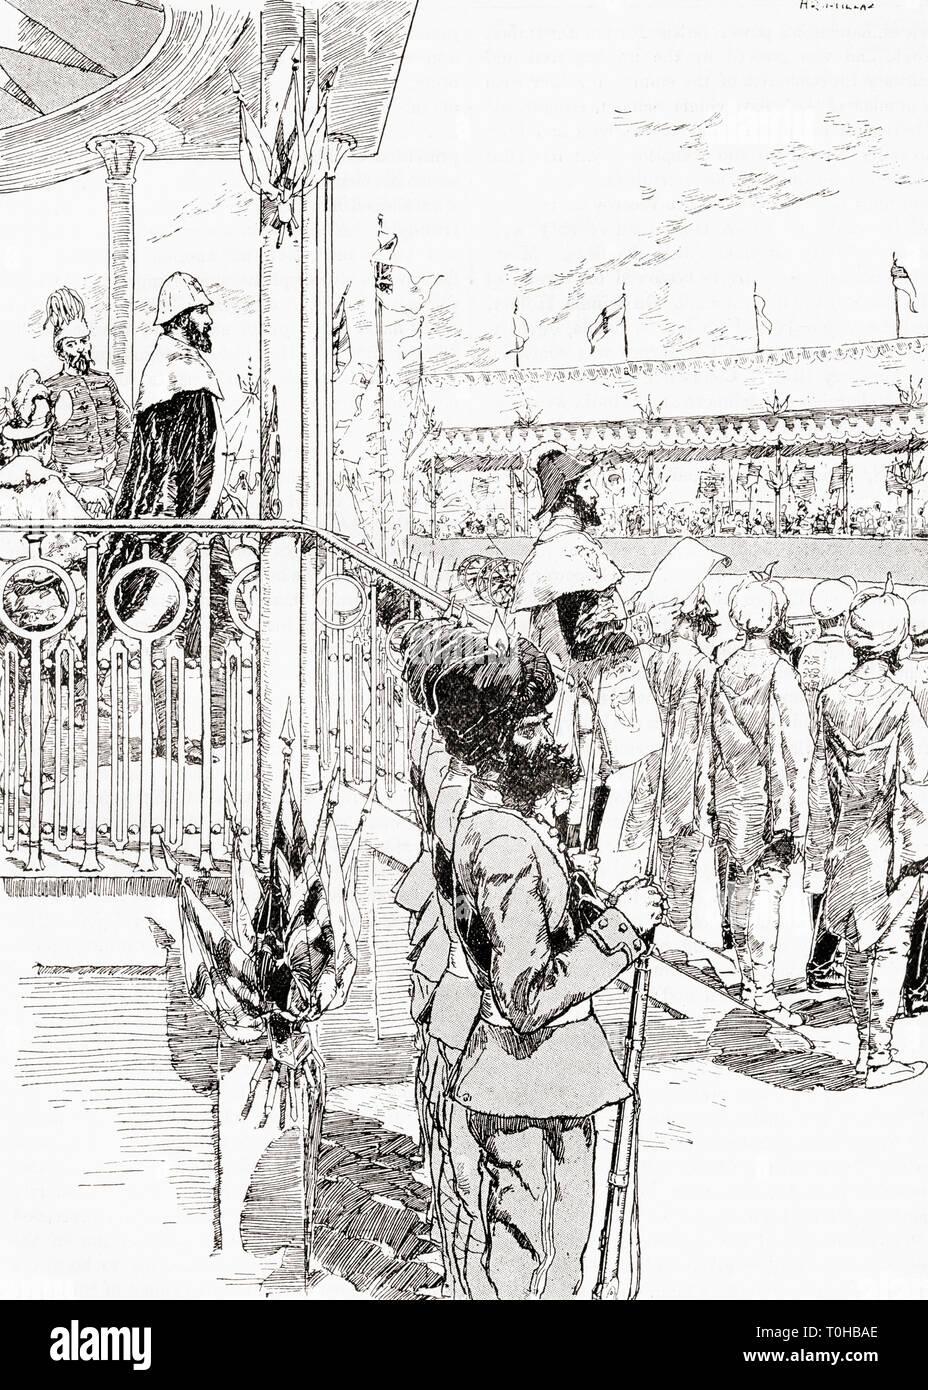 El virrey de la India, Robert Bulwer Lytton, Delhi, 1877 Foto de stock